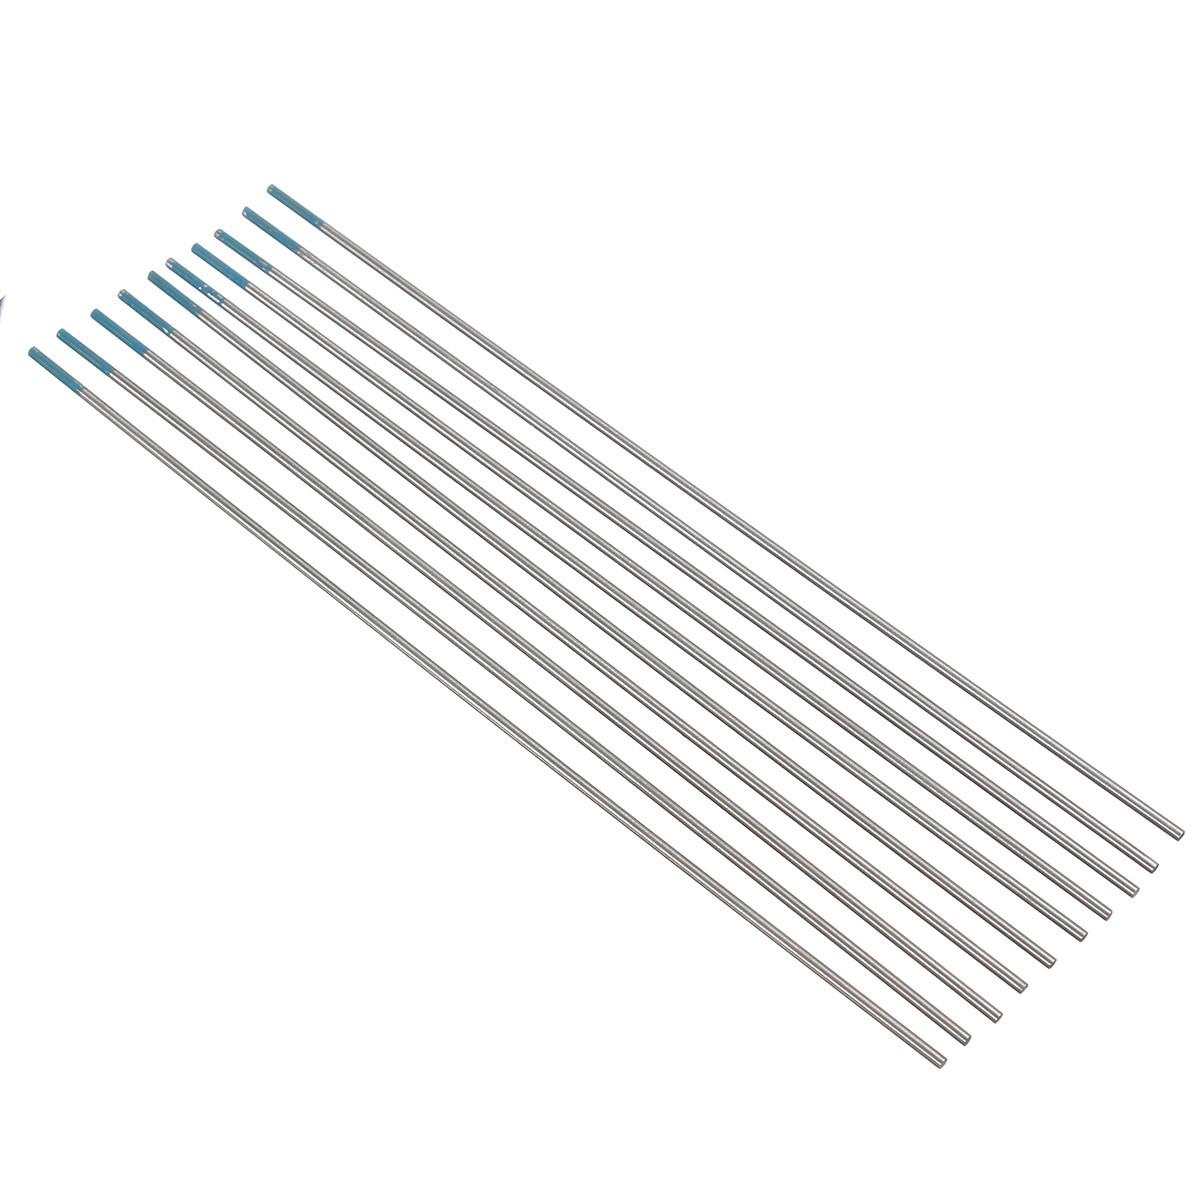 10pcs 2% Lanthanated WL20 Sky Blue TIG Welding Tungsten